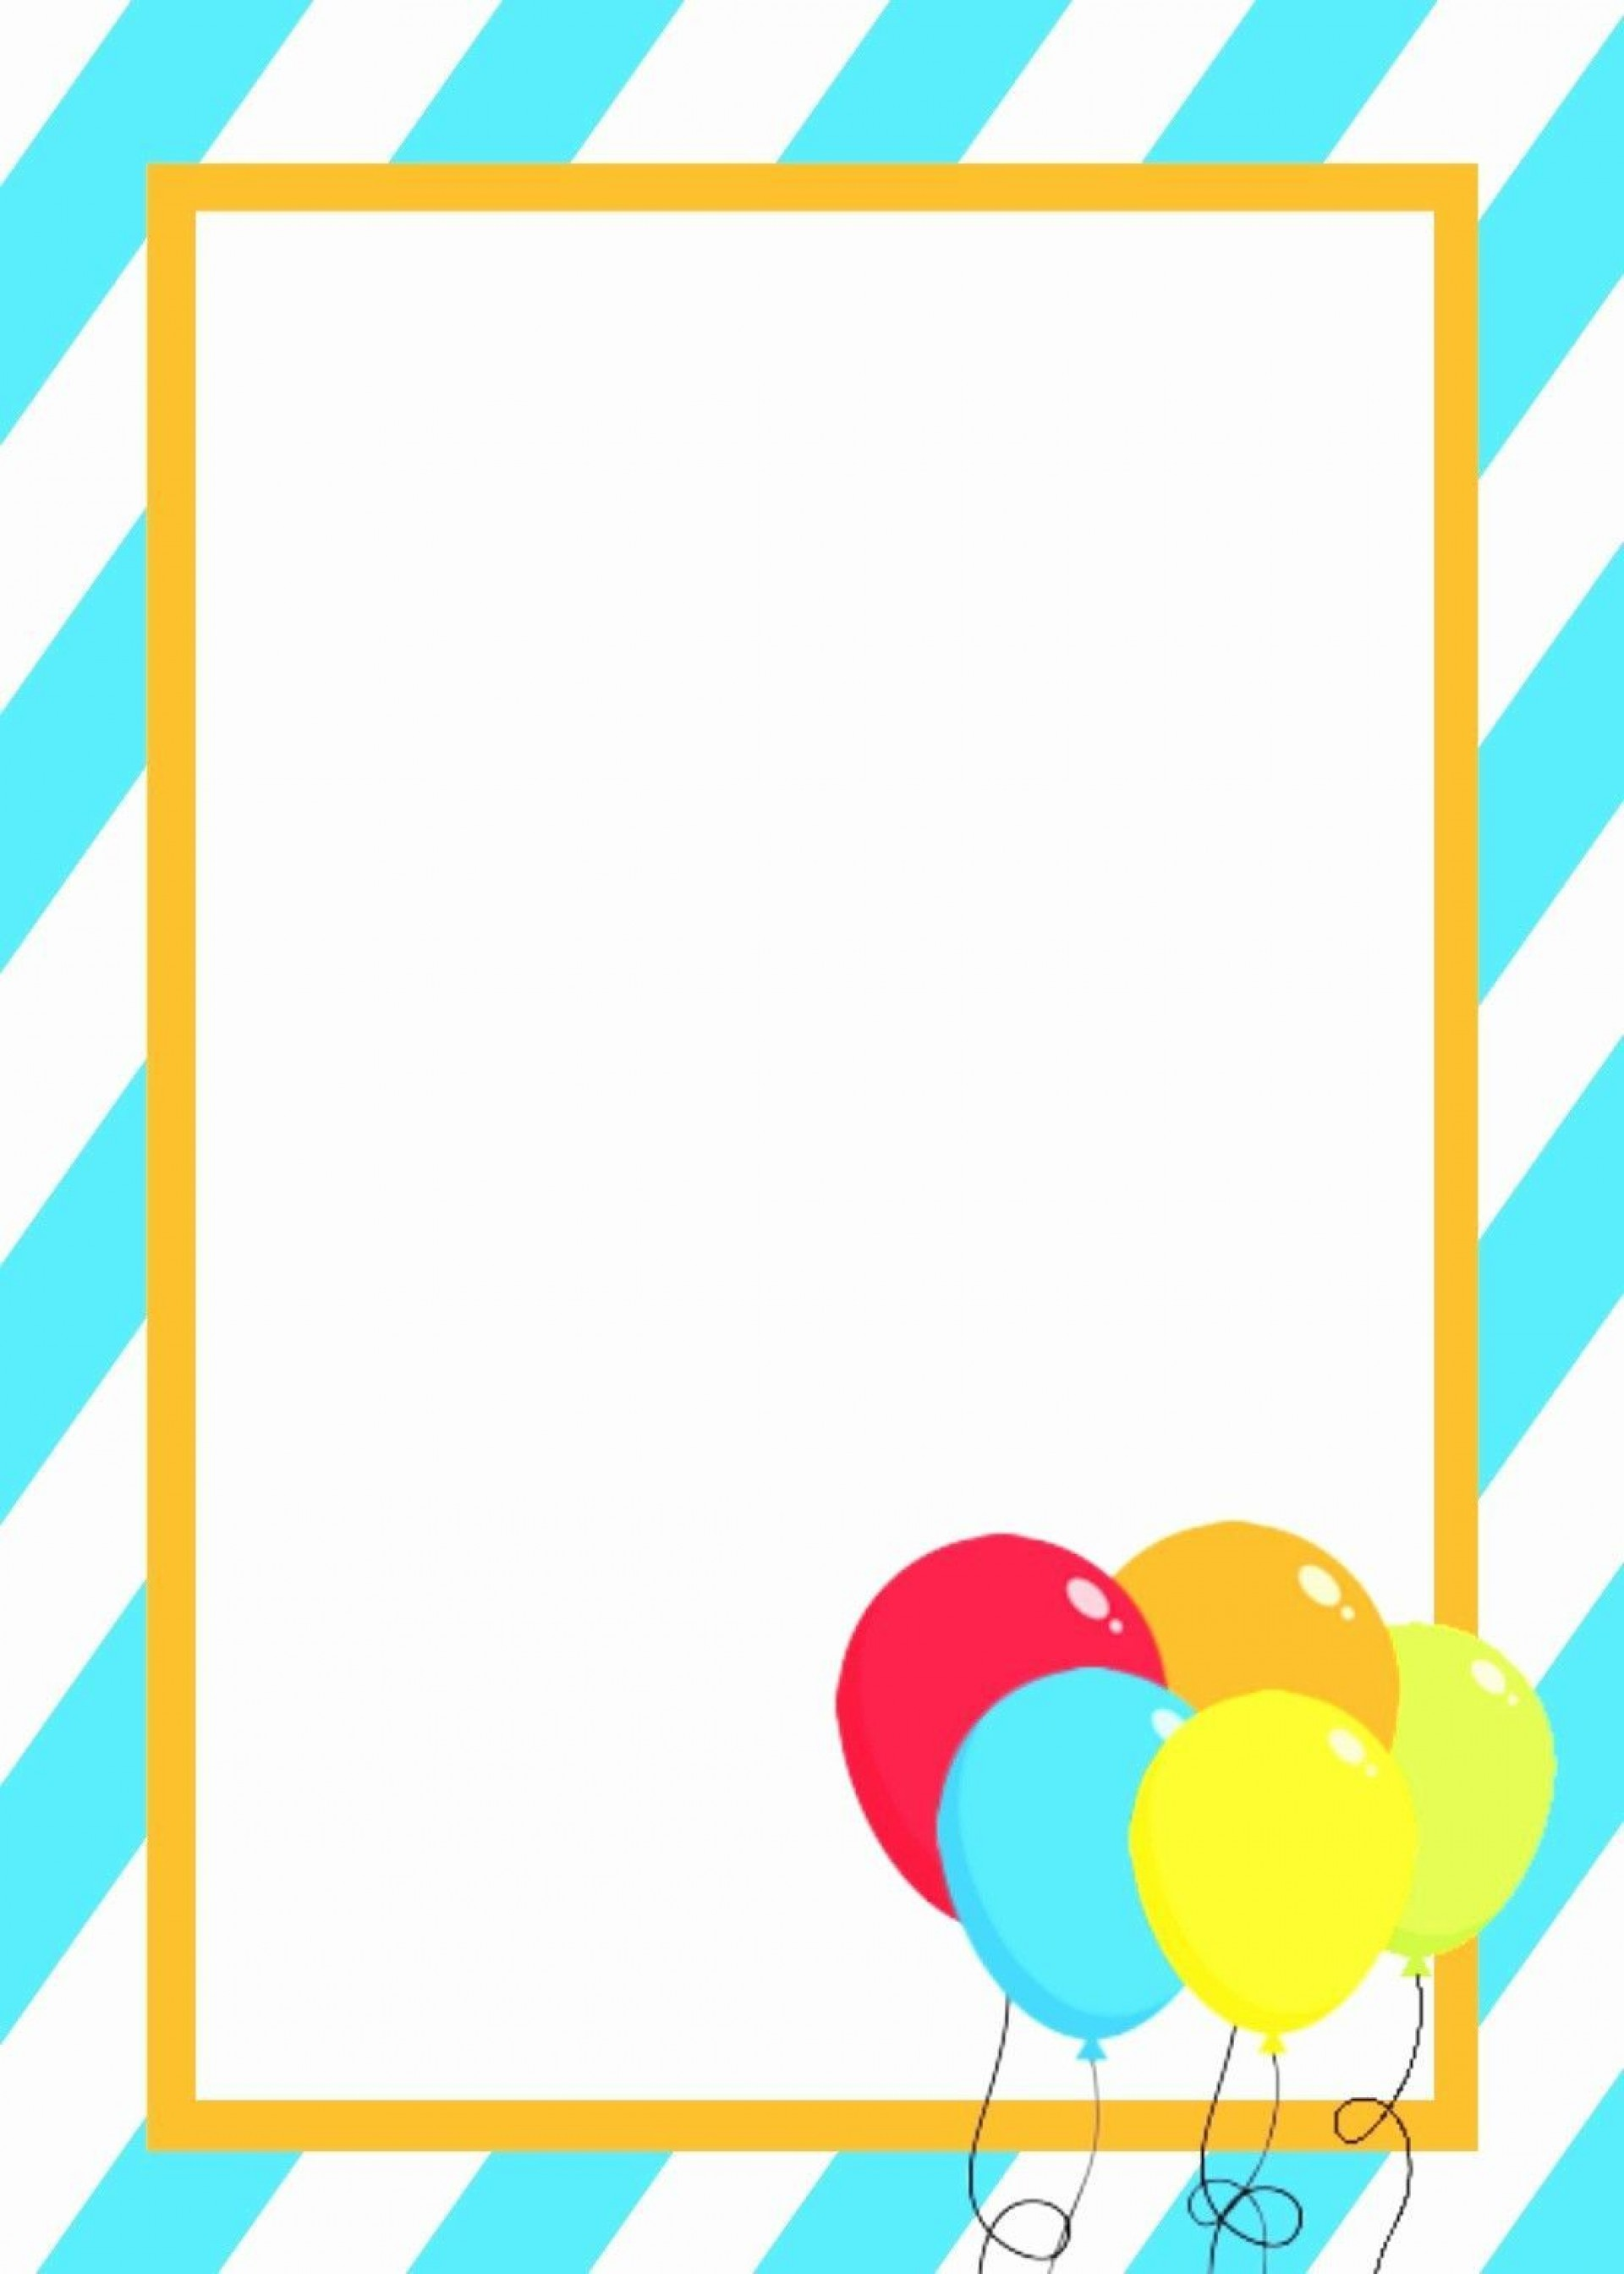 004 Imposing Birthday Invitation Template Word 2020 Example 1920